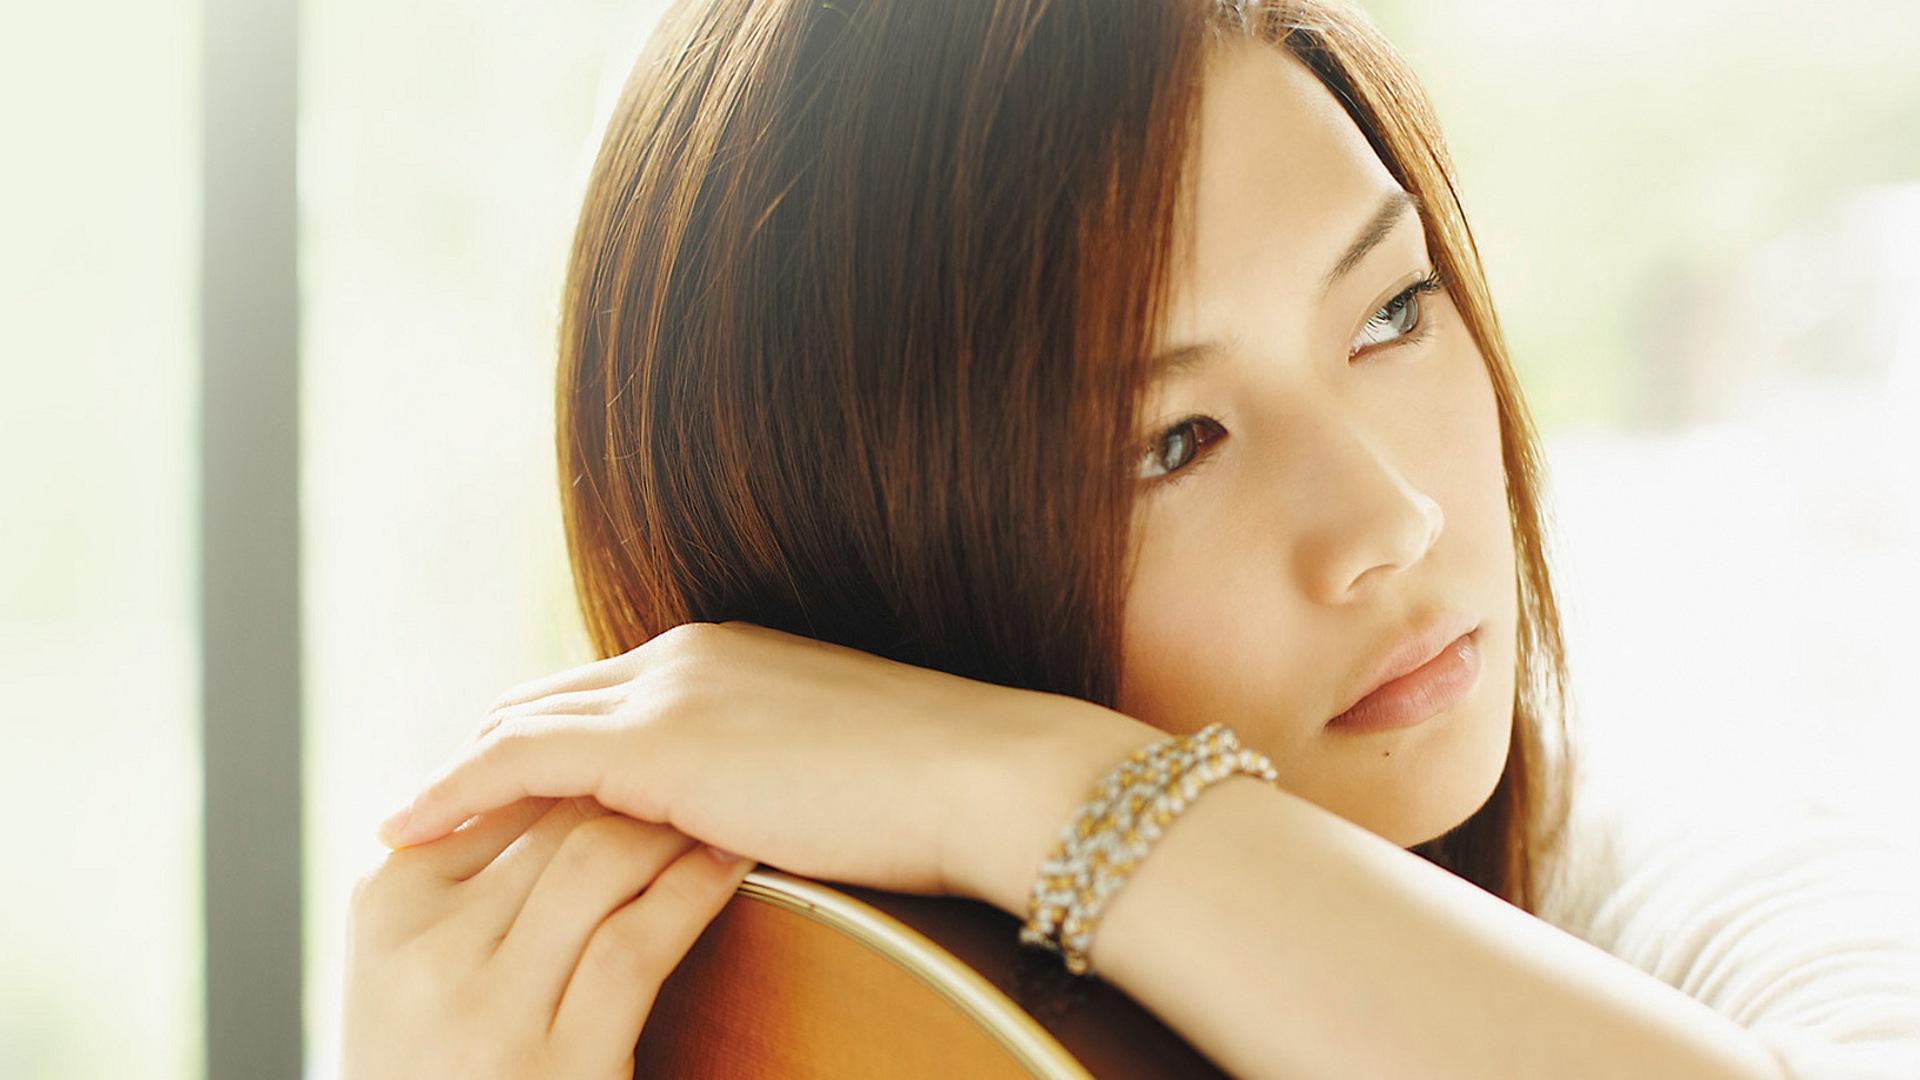 japanese singer yoshioka yui hd wallpapers 13 1920x1080 wallpaper